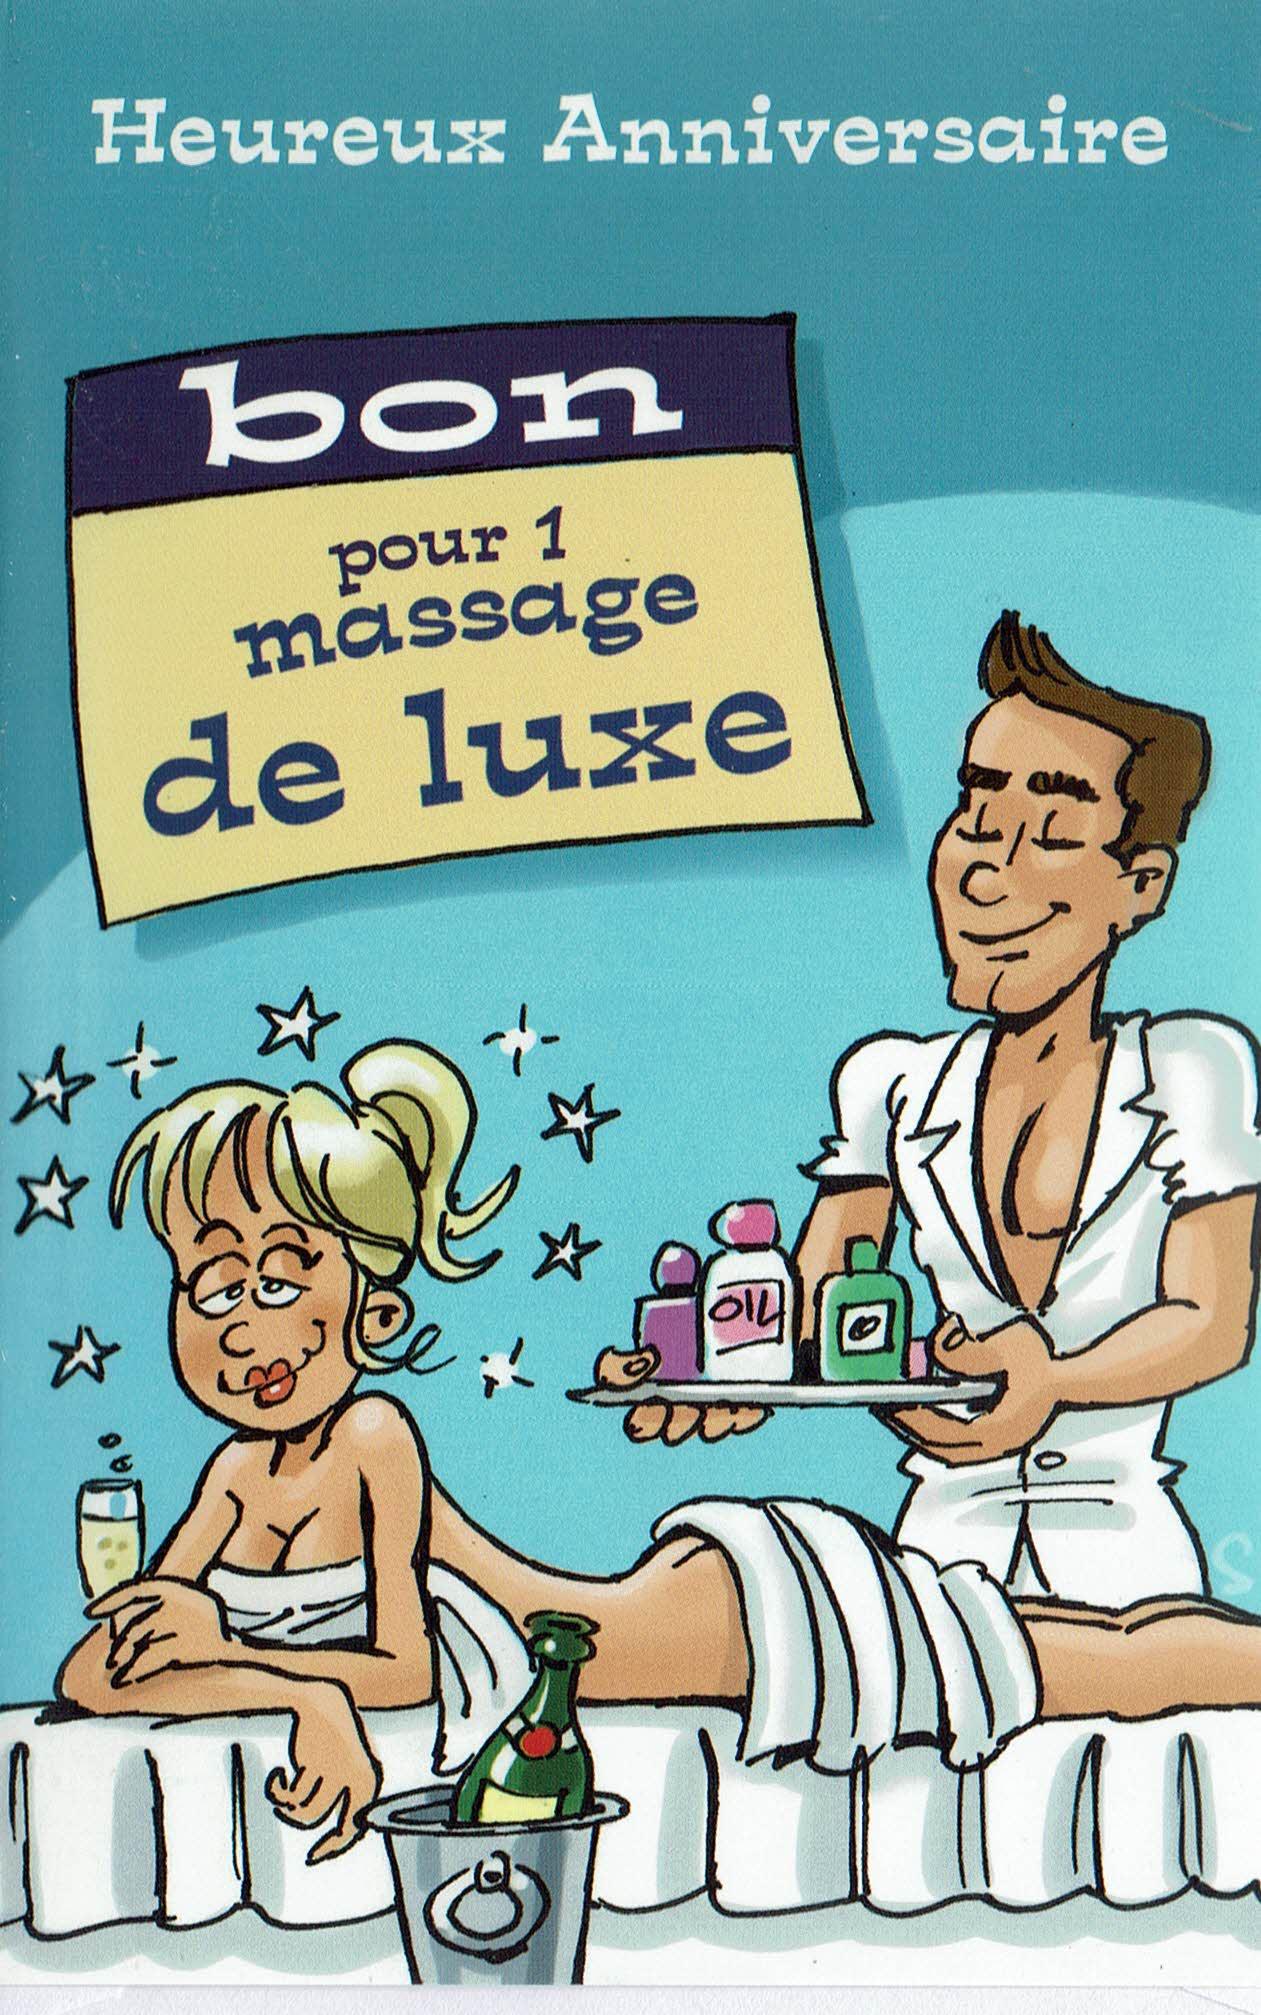 Franstalige Humor Kaart Voor Verjaardag